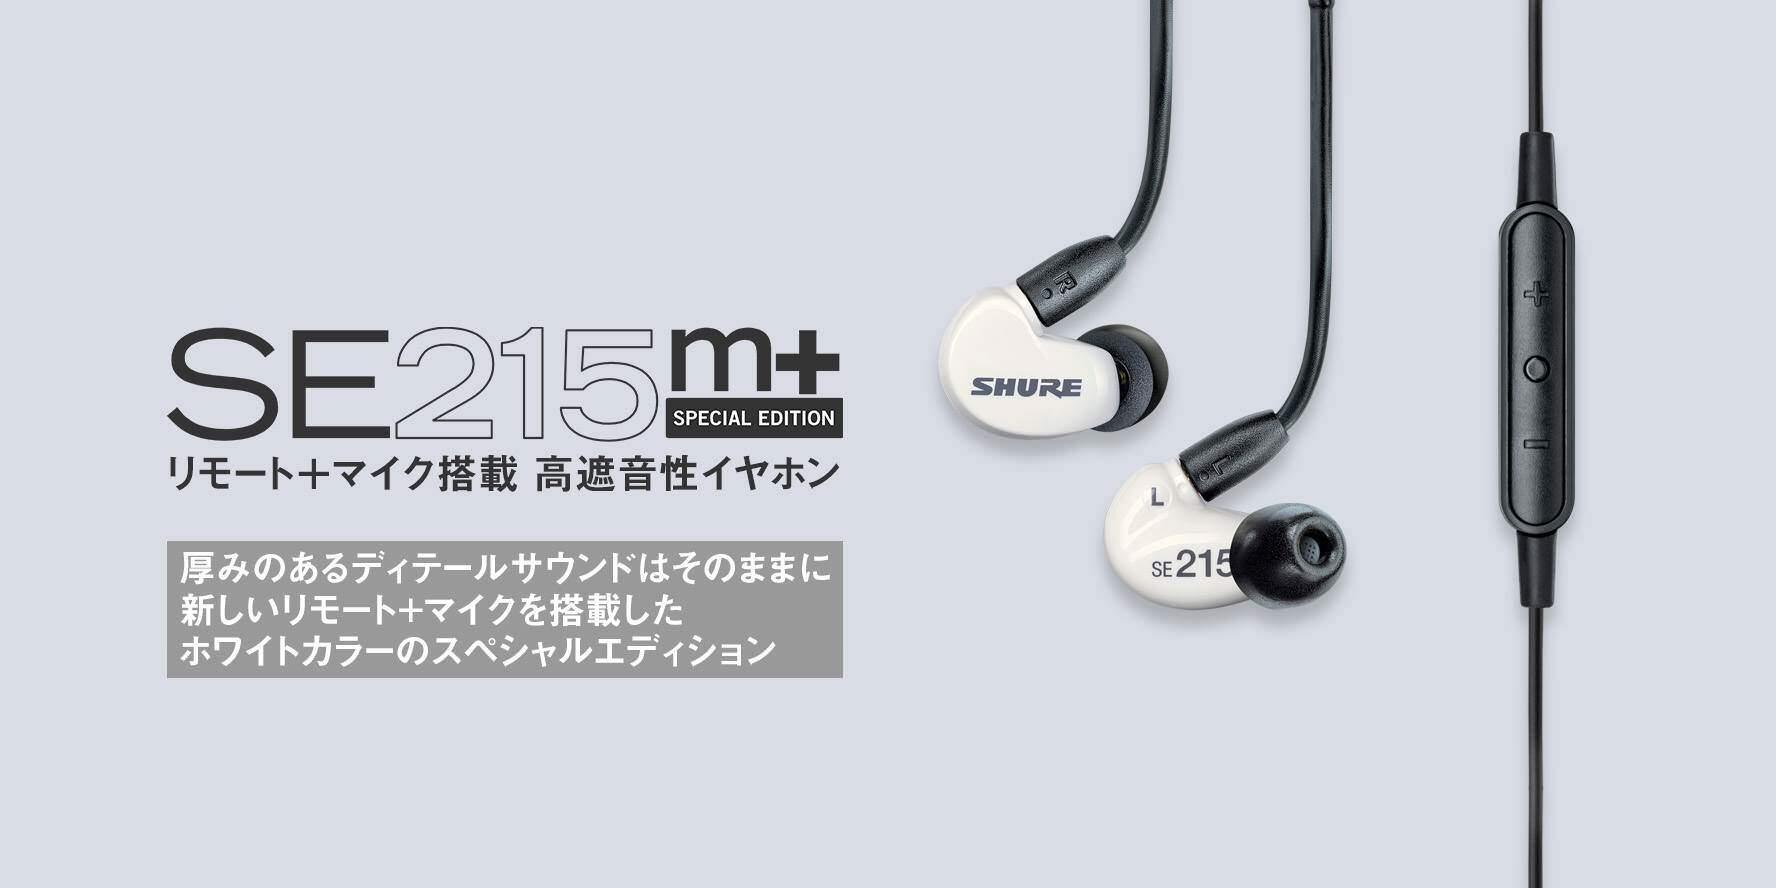 ShureよりSE215SPEにマイクが付いたホワイトなSE215m+ Special Editionを発表